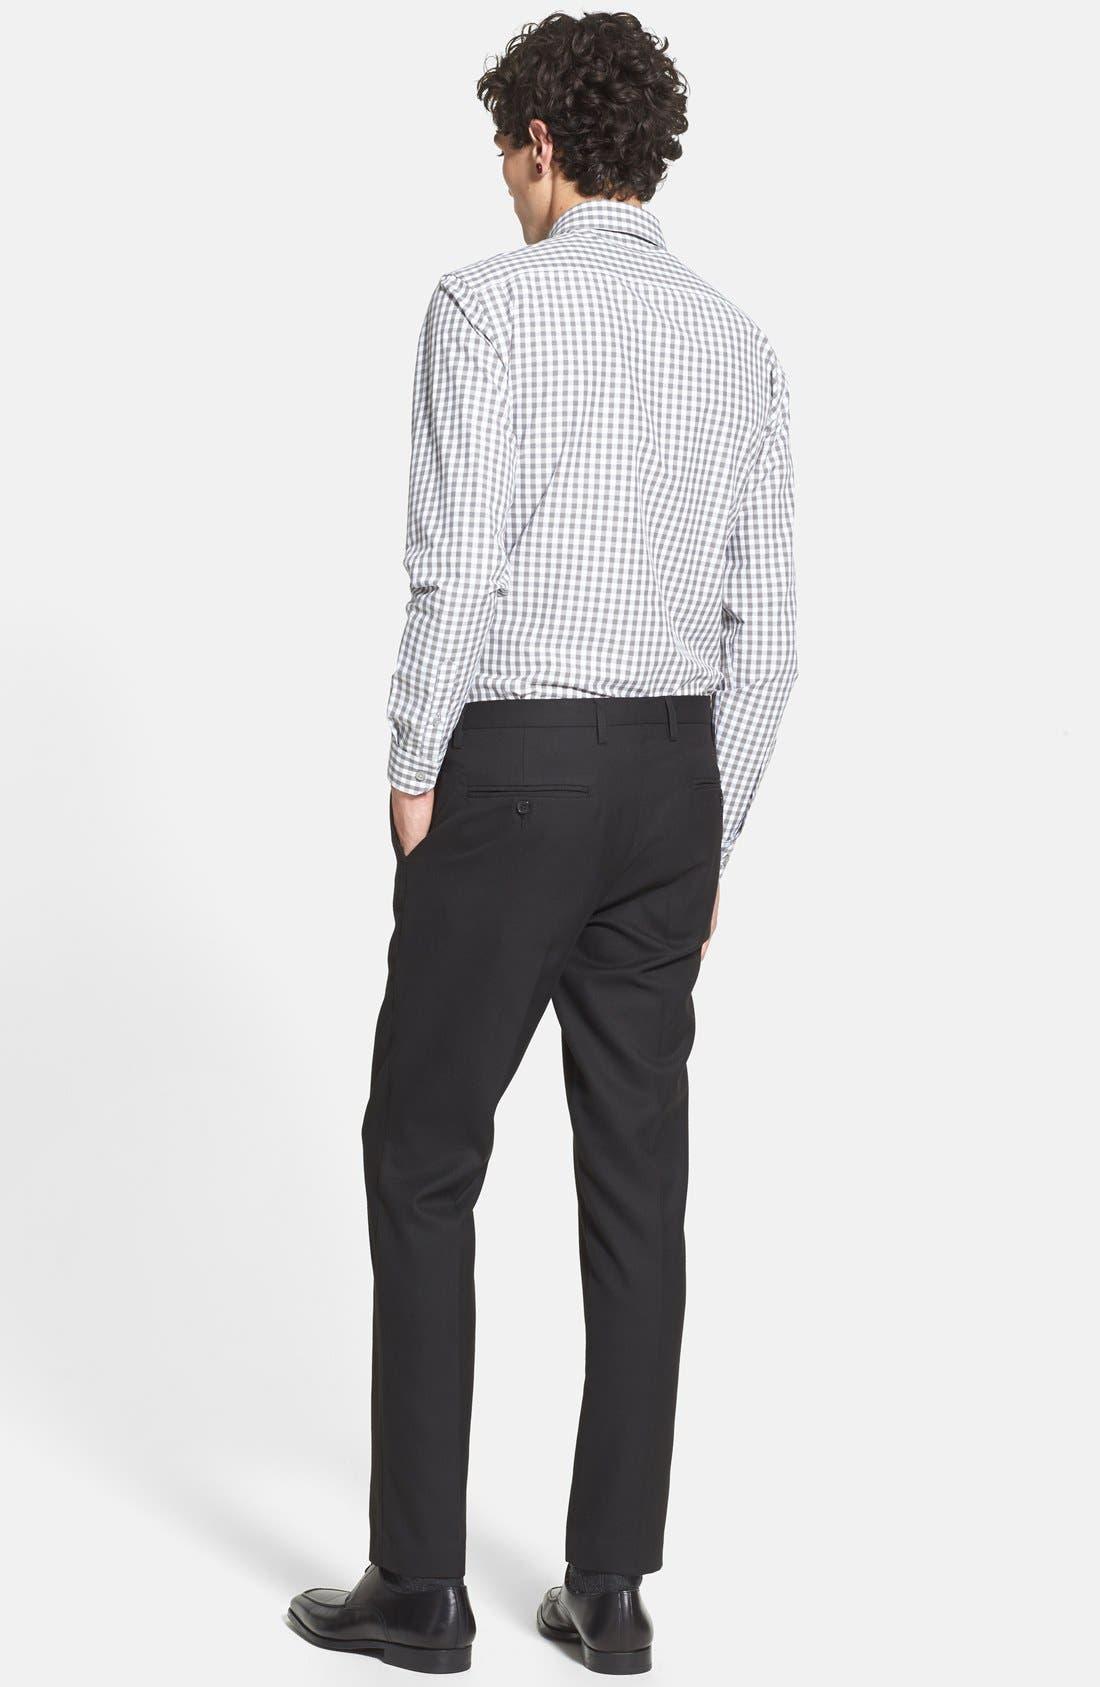 TOPMAN, Skinny Fit Cotton Flannel Trousers, Alternate thumbnail 2, color, 001